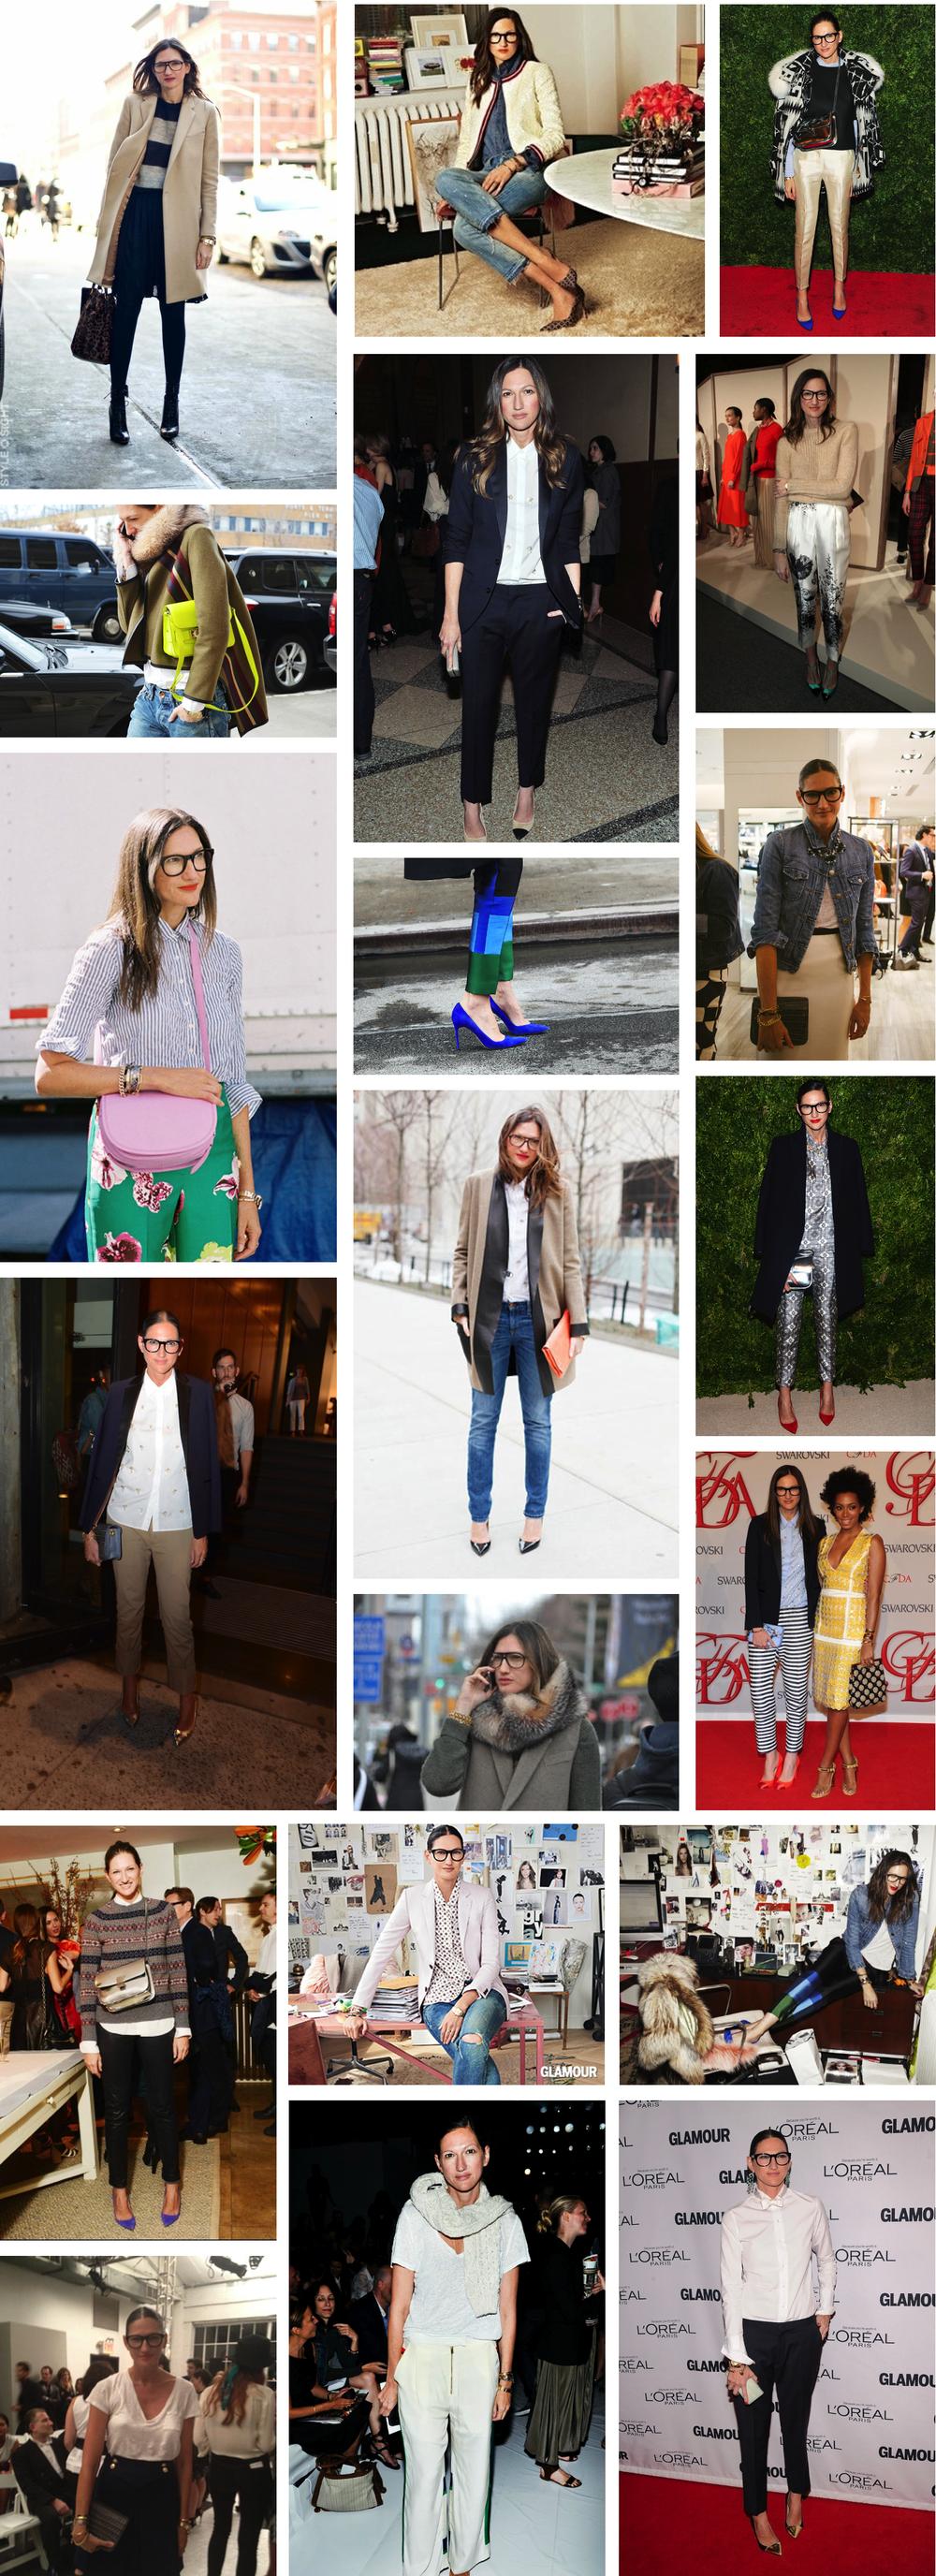 Jenna Lyons, the Style Icon